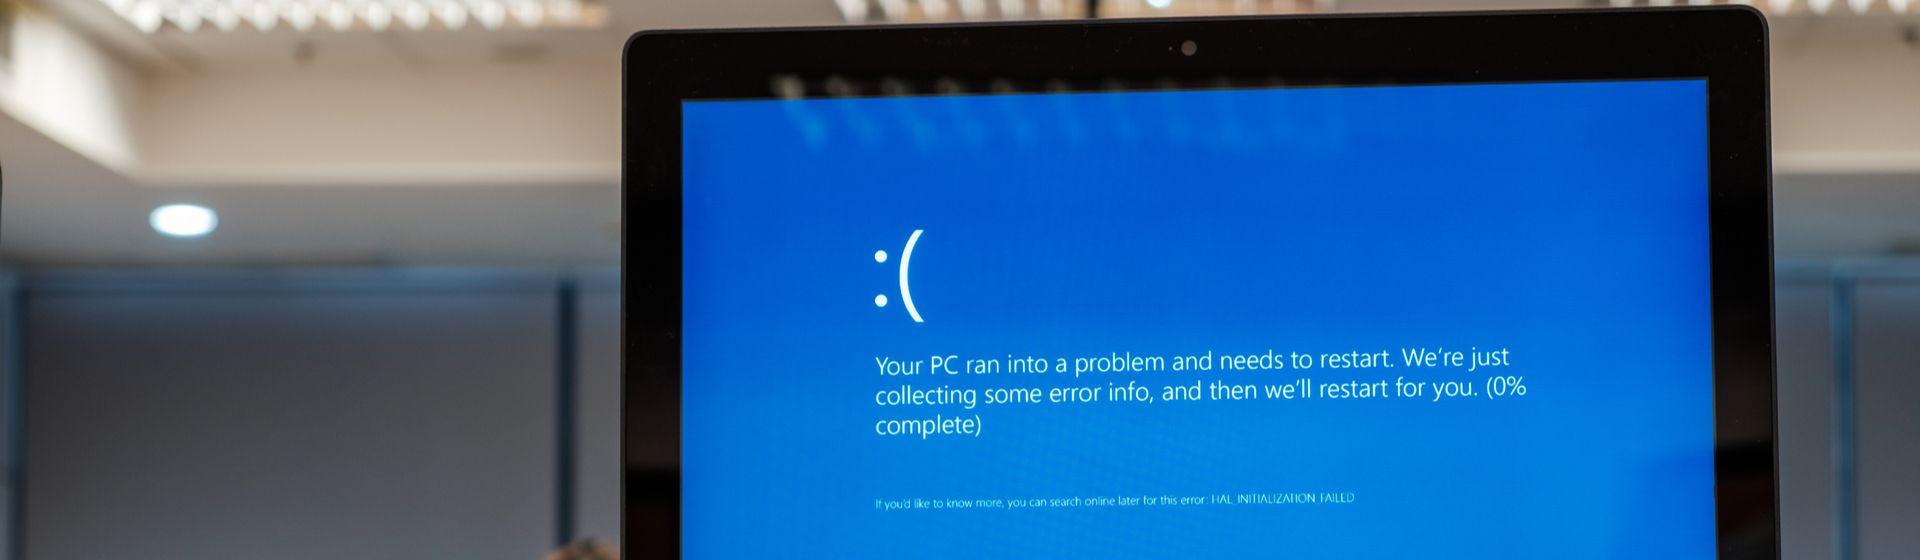 Como solucionar o erro que causa o código 43 do Windows